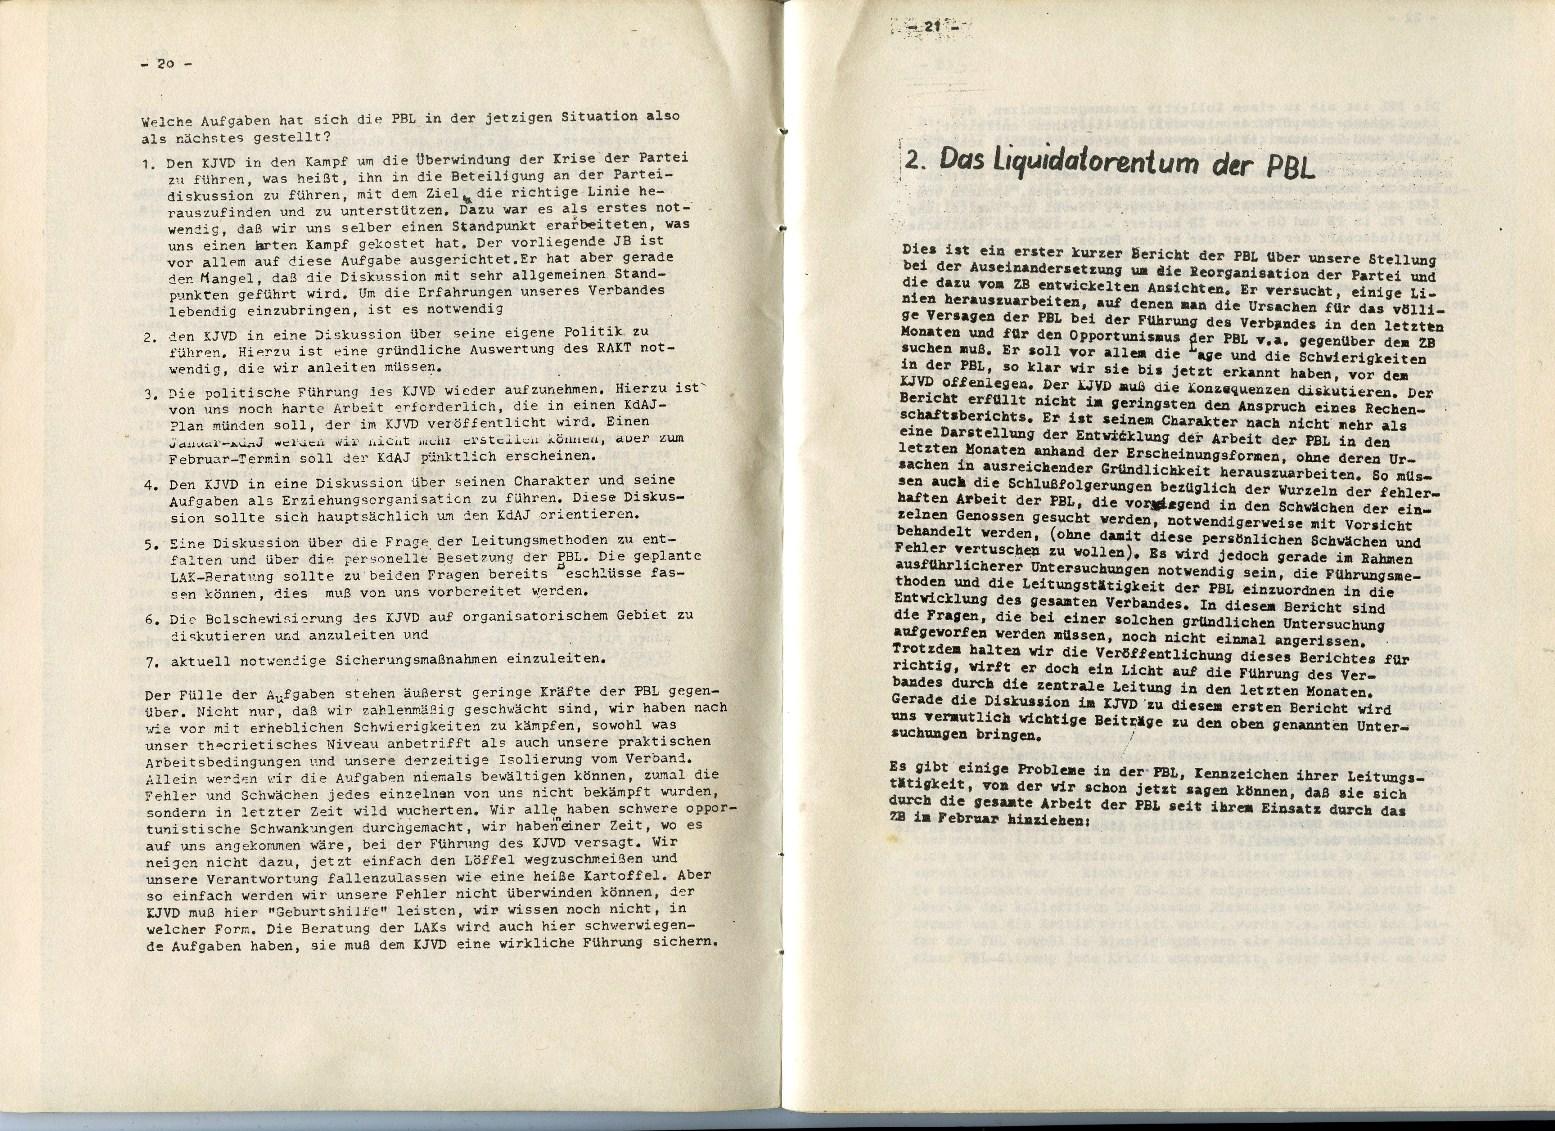 ZB_Universitas_1972_14